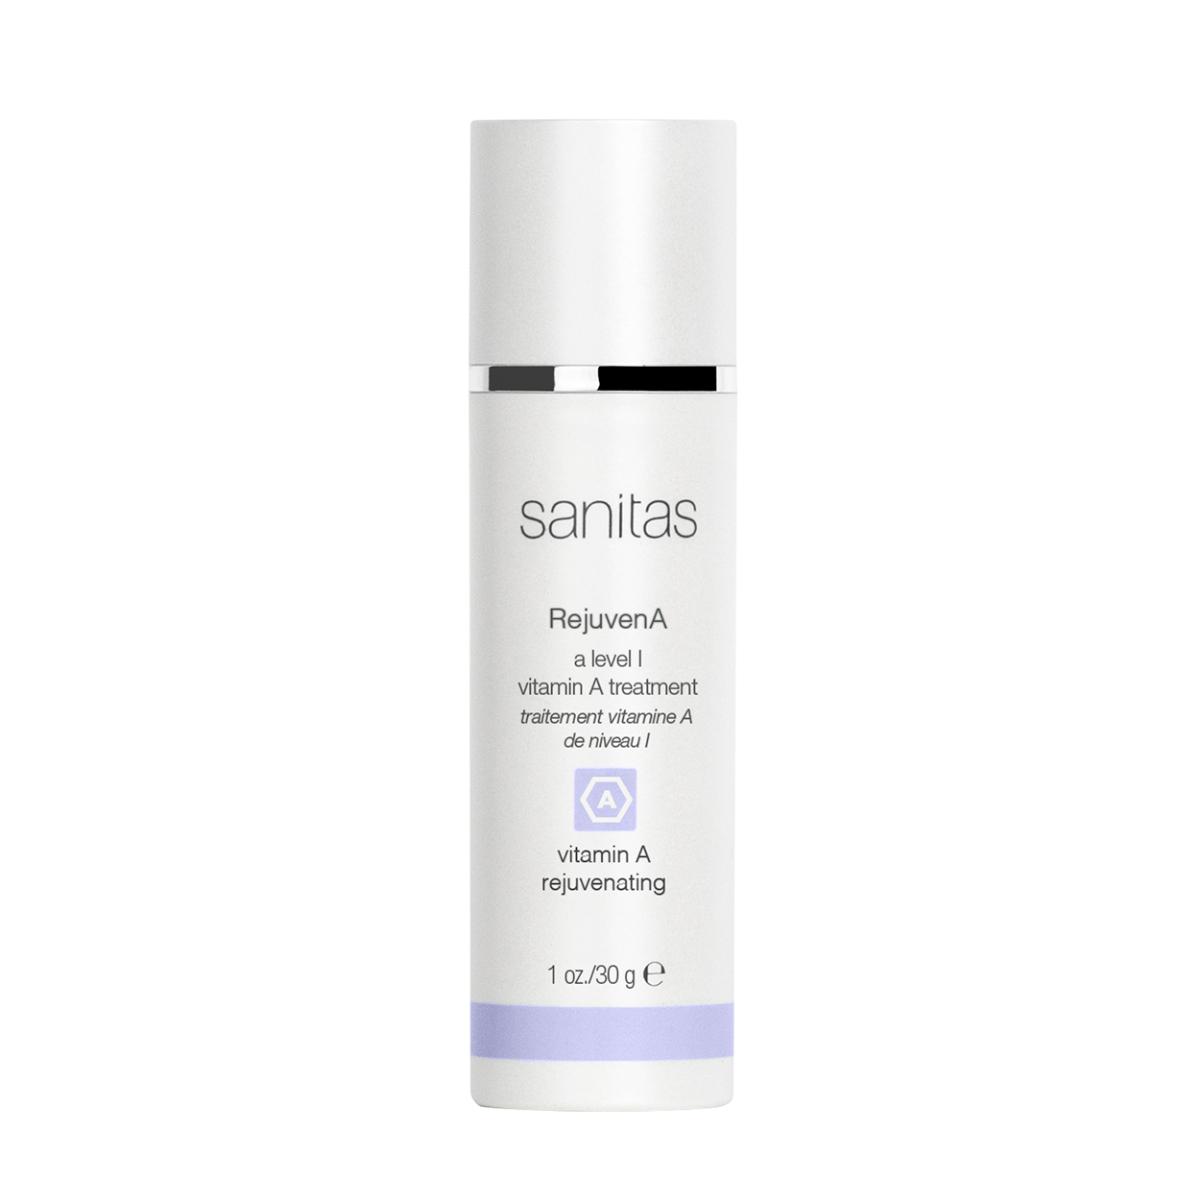 Sanitas Skincare Rejuvena 1oz Skin Care Collagen Treatment